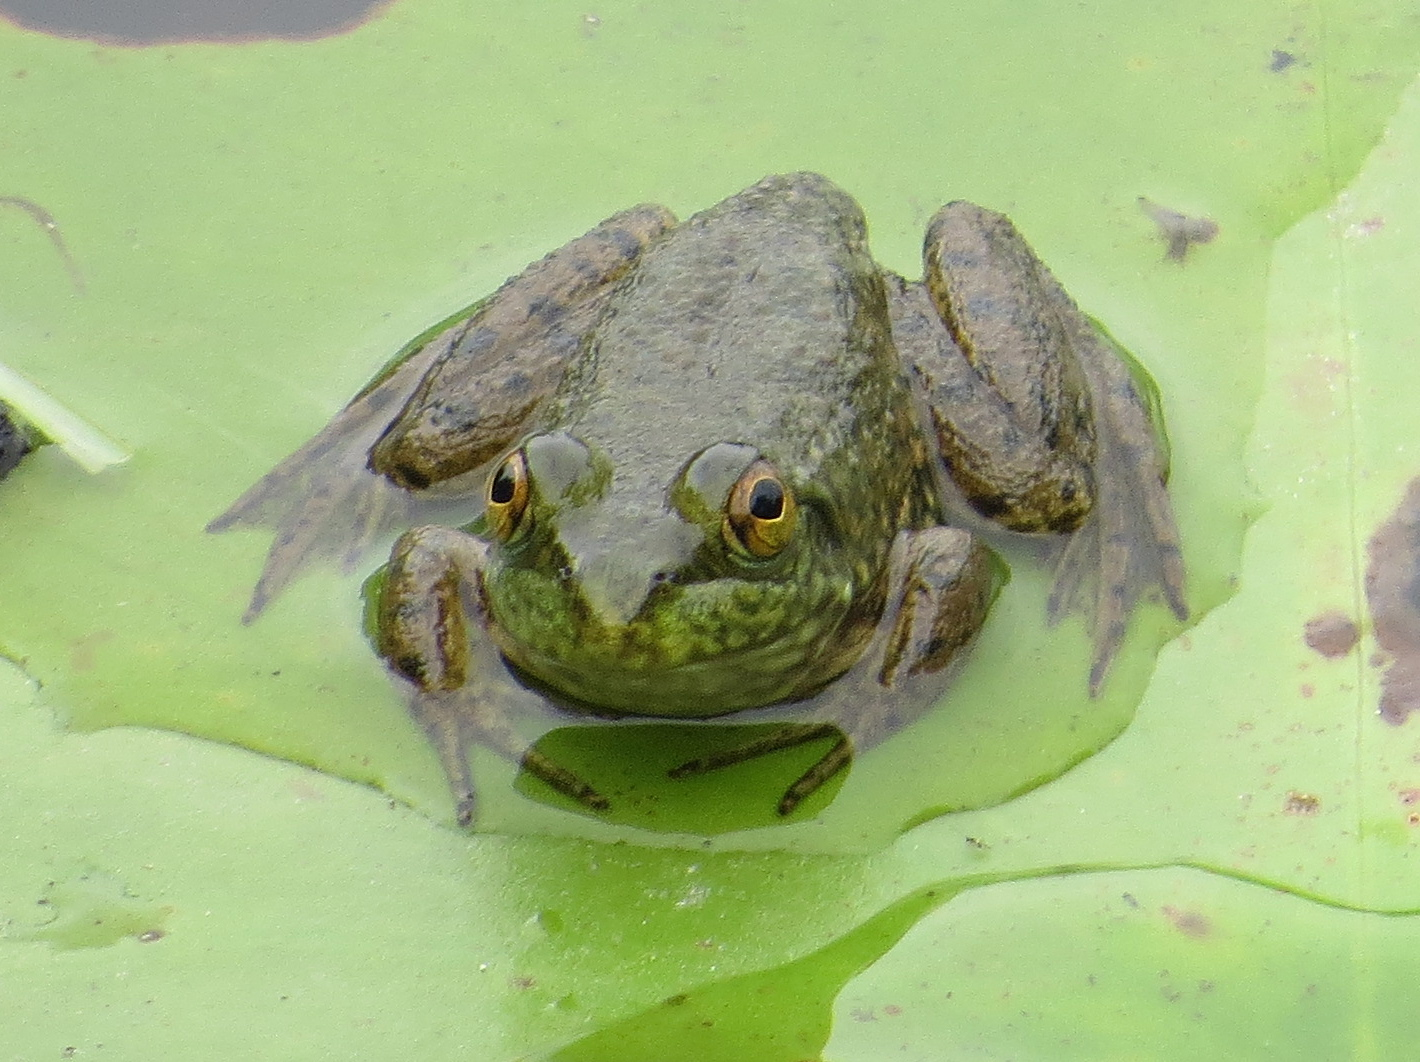 Backyard Frogs frogs | backyard and beyond | page 2